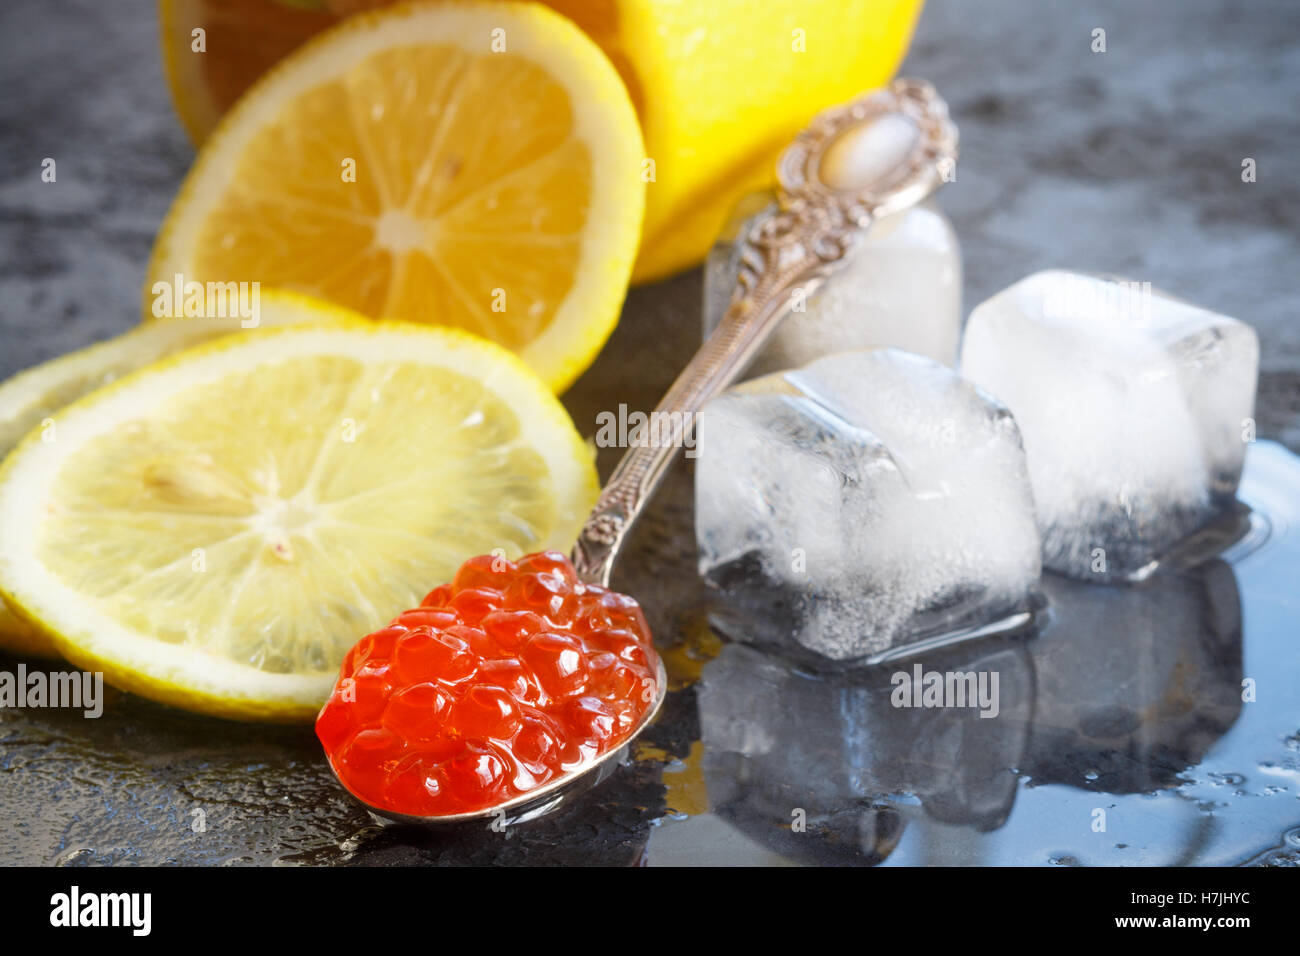 Rot-Lachs-Kaviar und Zitrone. Selektiven Fokus Stockbild